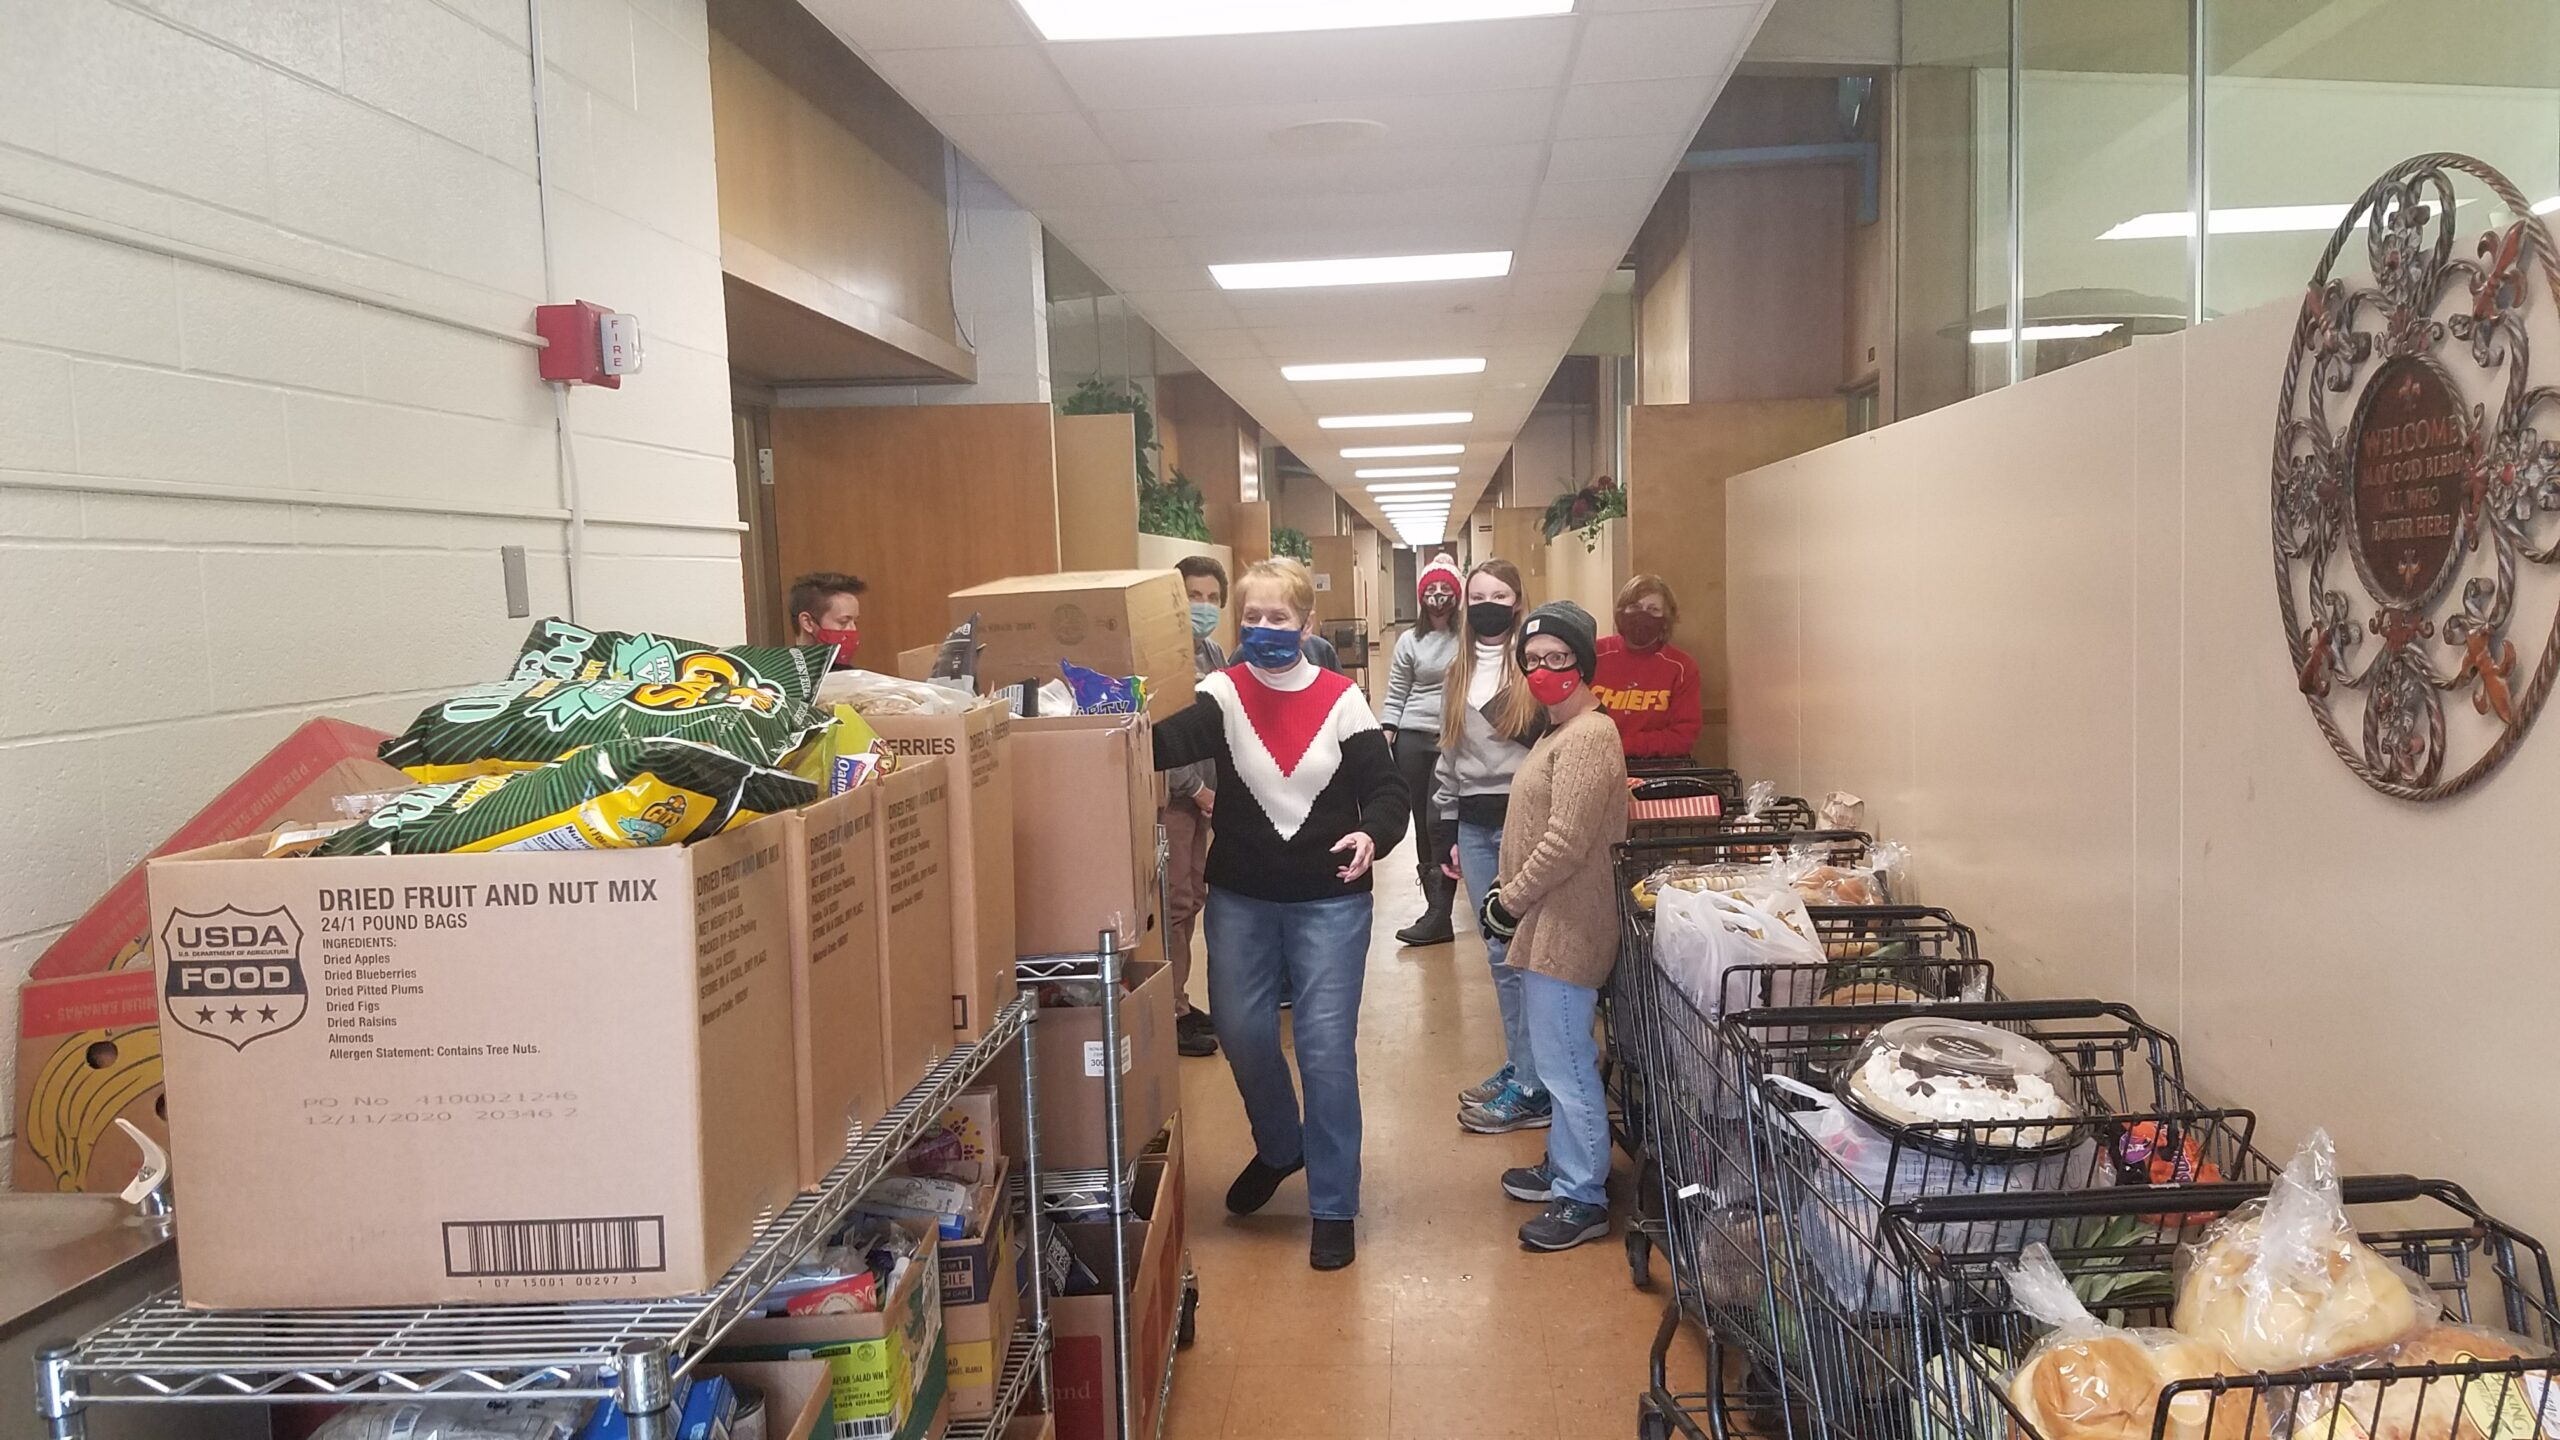 Carol Blackwell And Volunteers Helping On Sunday In Feb